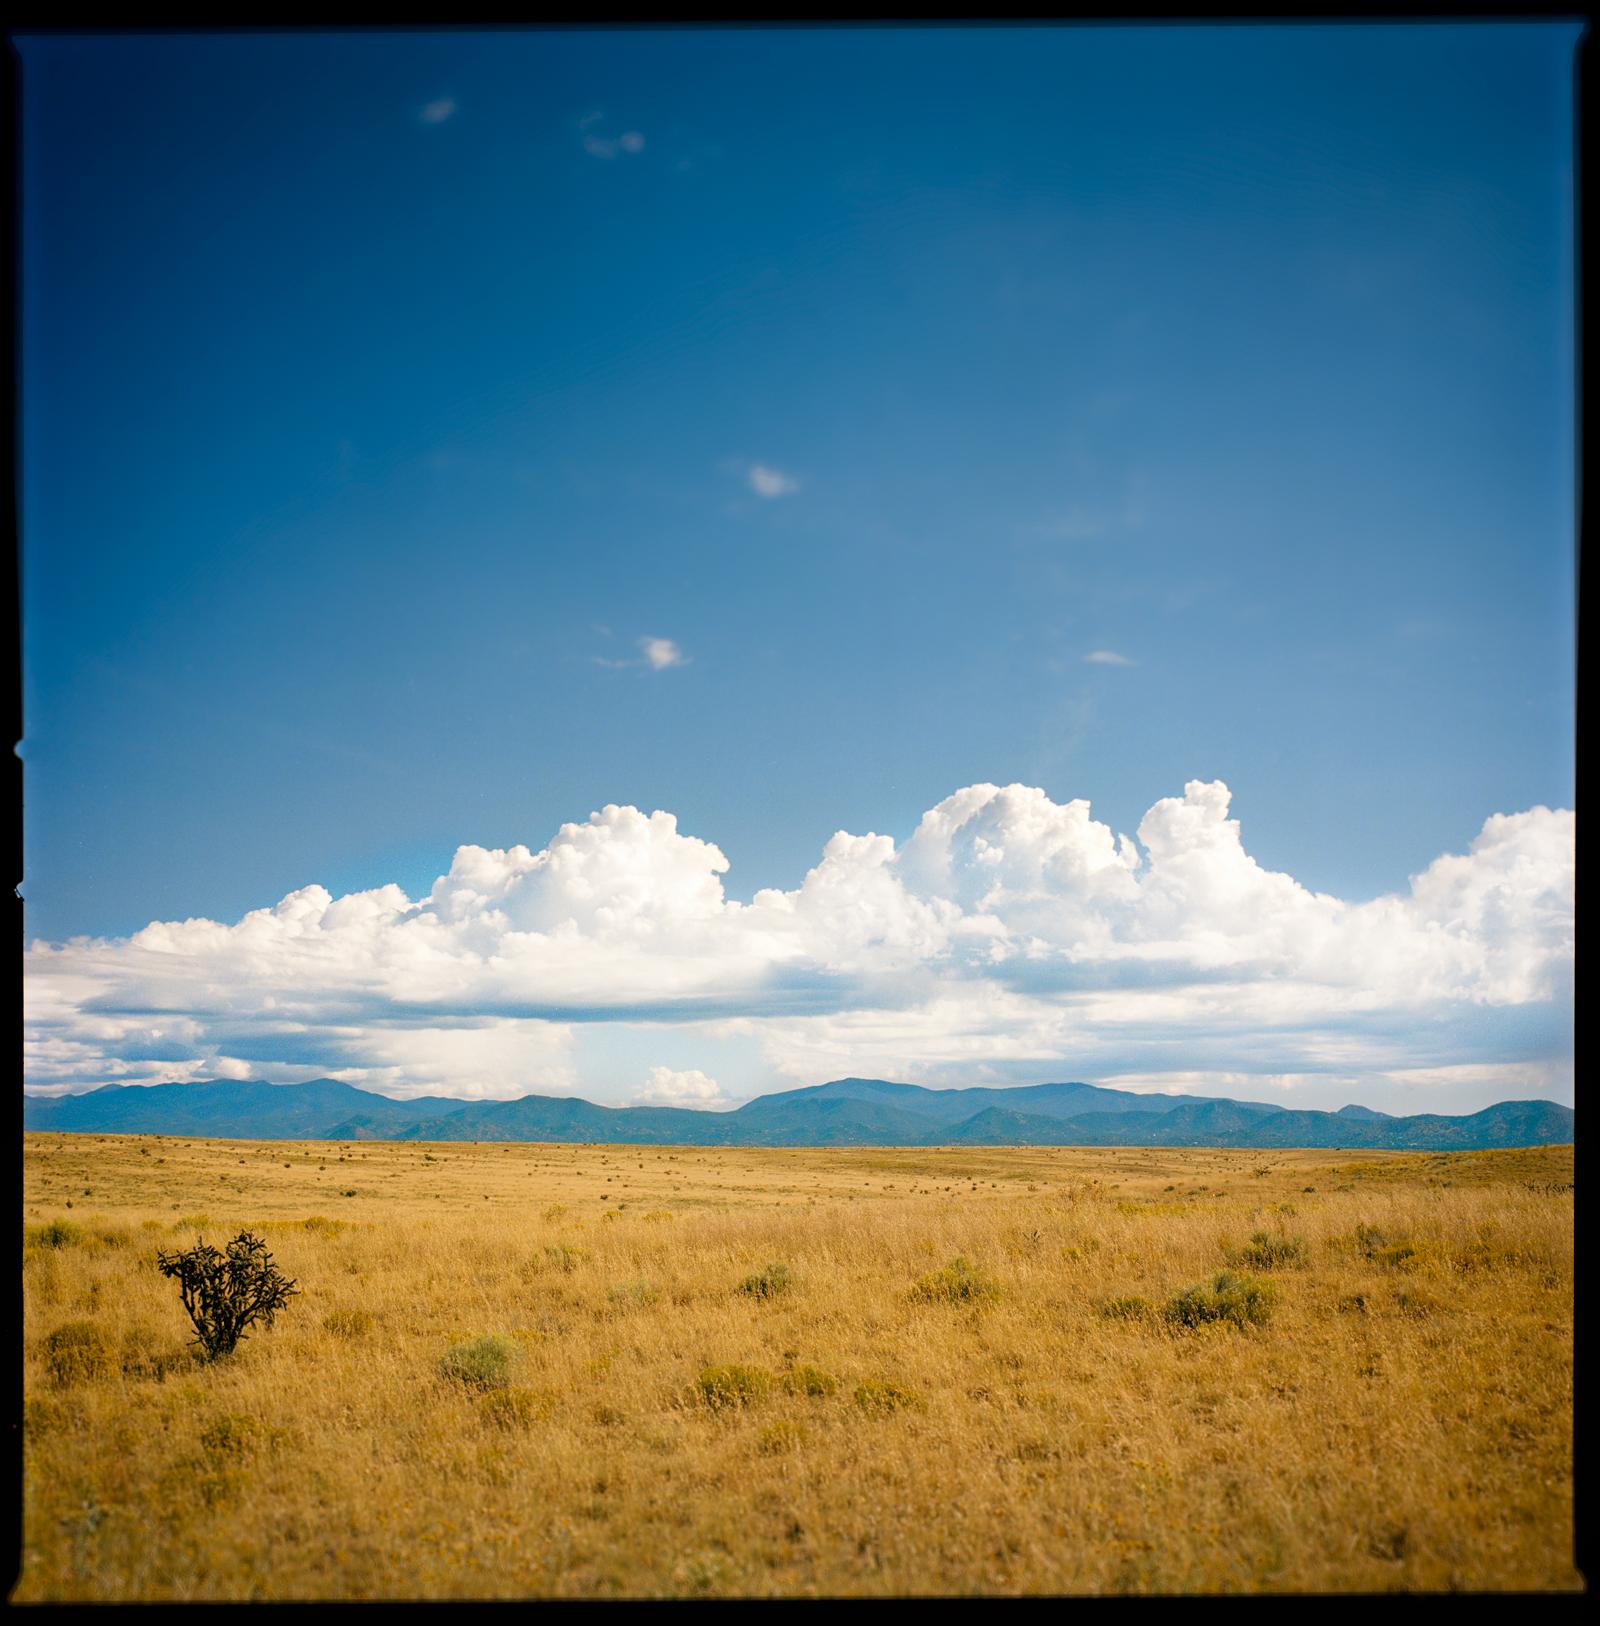 Western Plains